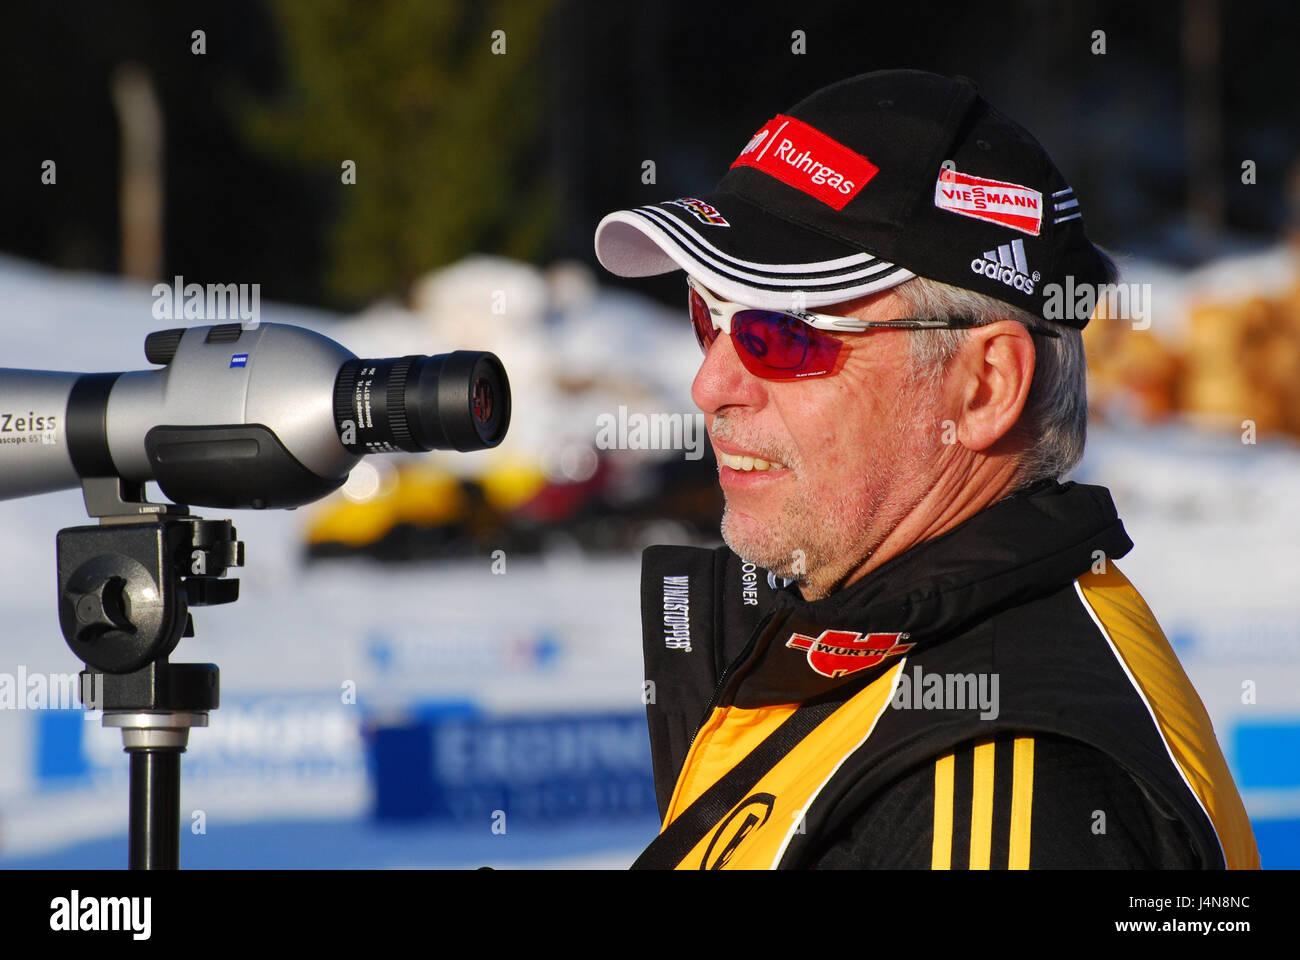 Austria, Tyrol, Pillerseetal, to high-level felts, biathlon, coach Uwe Müssiggang, page portrait, DSV, biathlon, - Stock Image